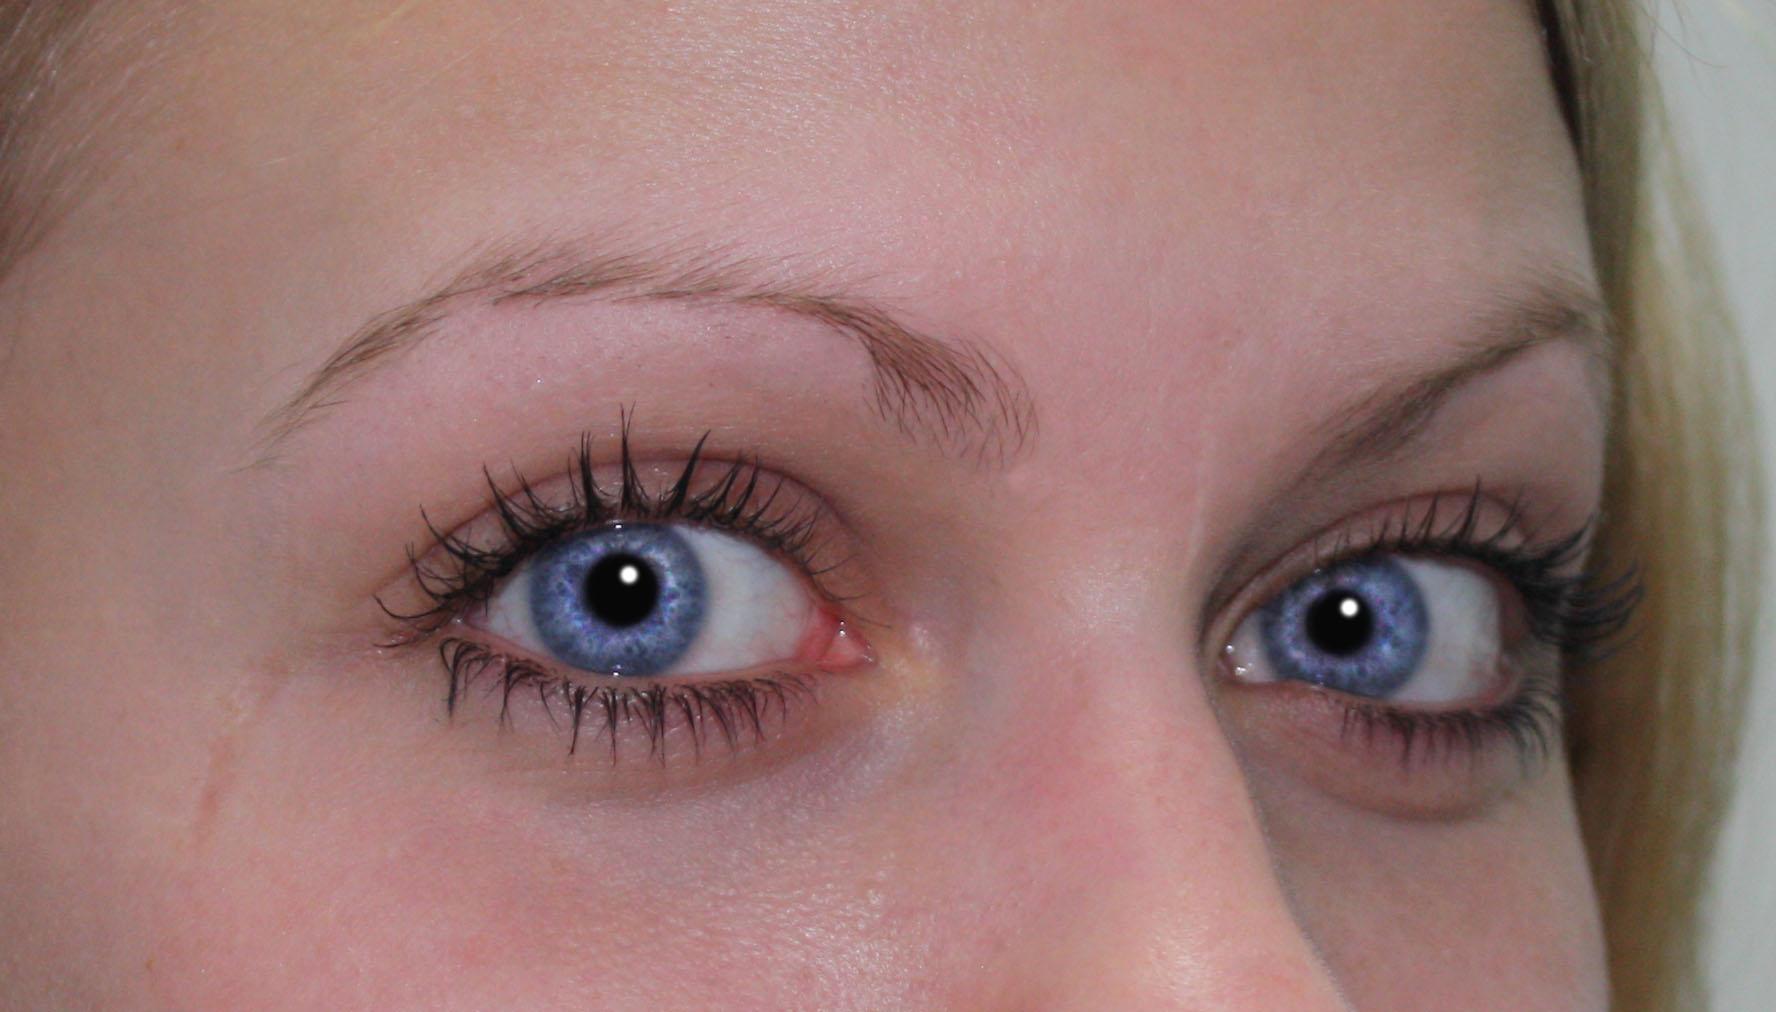 Eye Reflection Photoshop Done   the eyes are positively